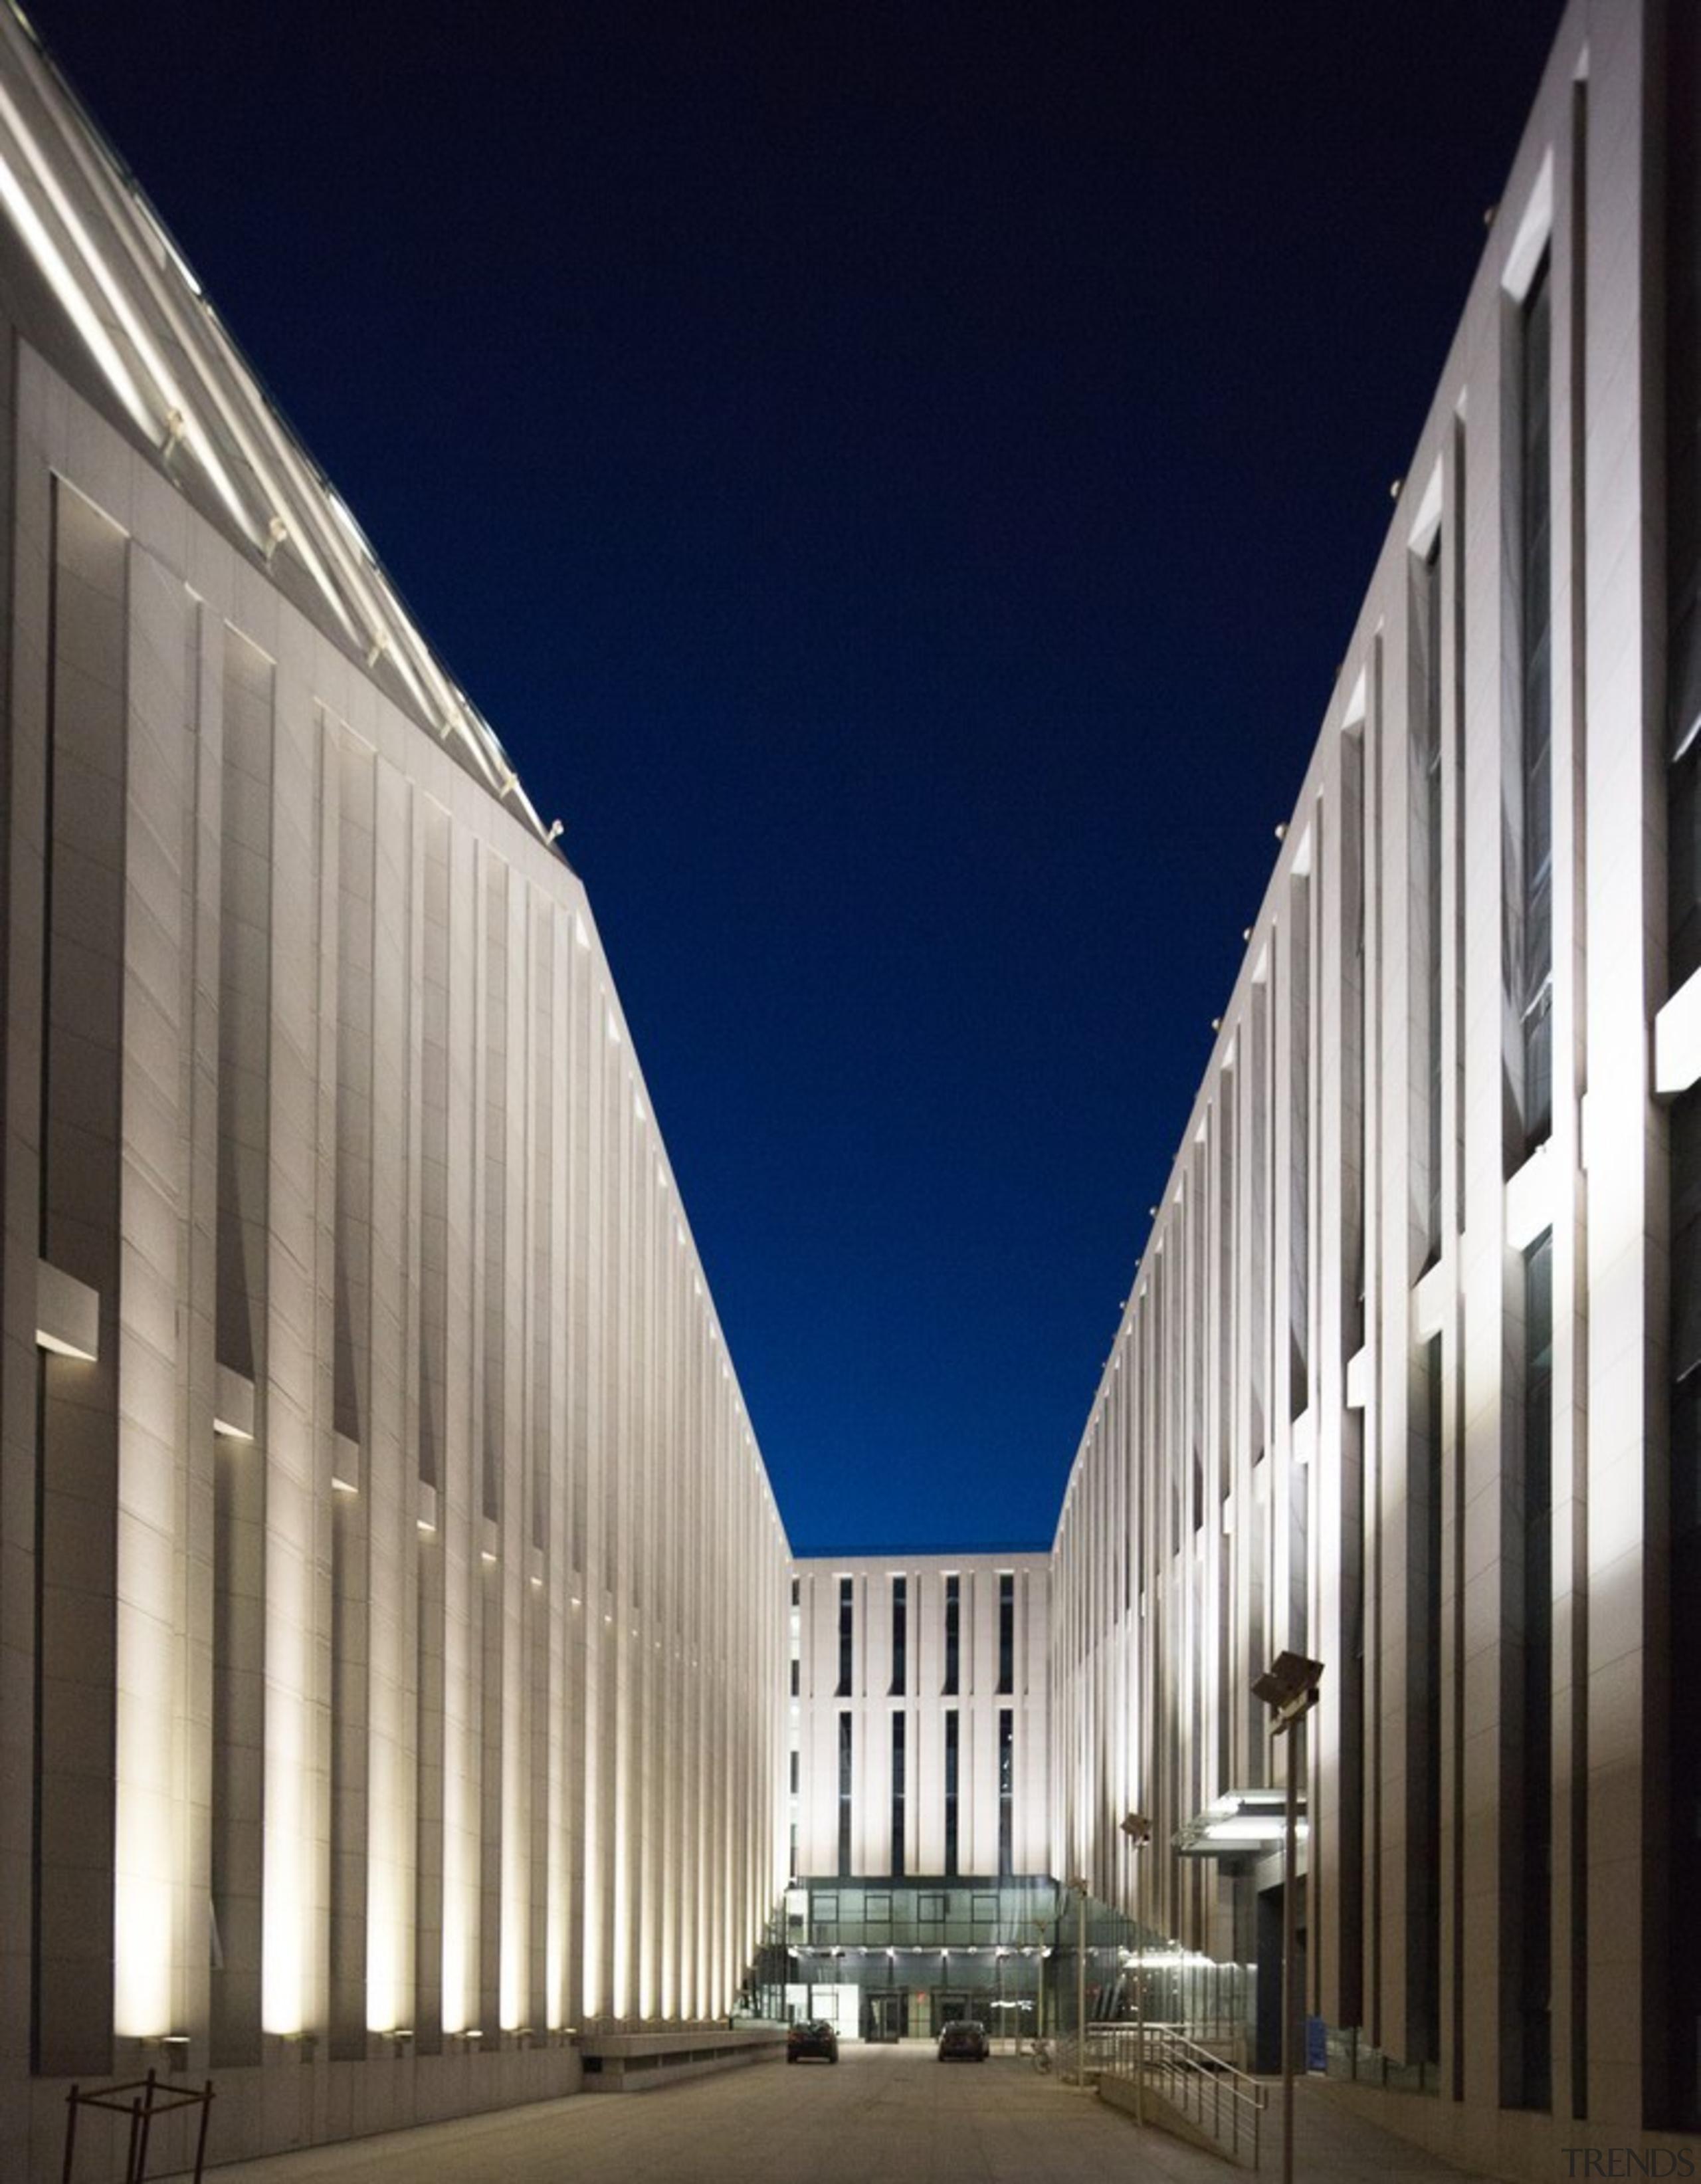 xxx - architecture   building   commercial building architecture, building, commercial building, corporate headquarters, daylighting, facade, headquarters, metropolitan area, sky, structure, gray, blue